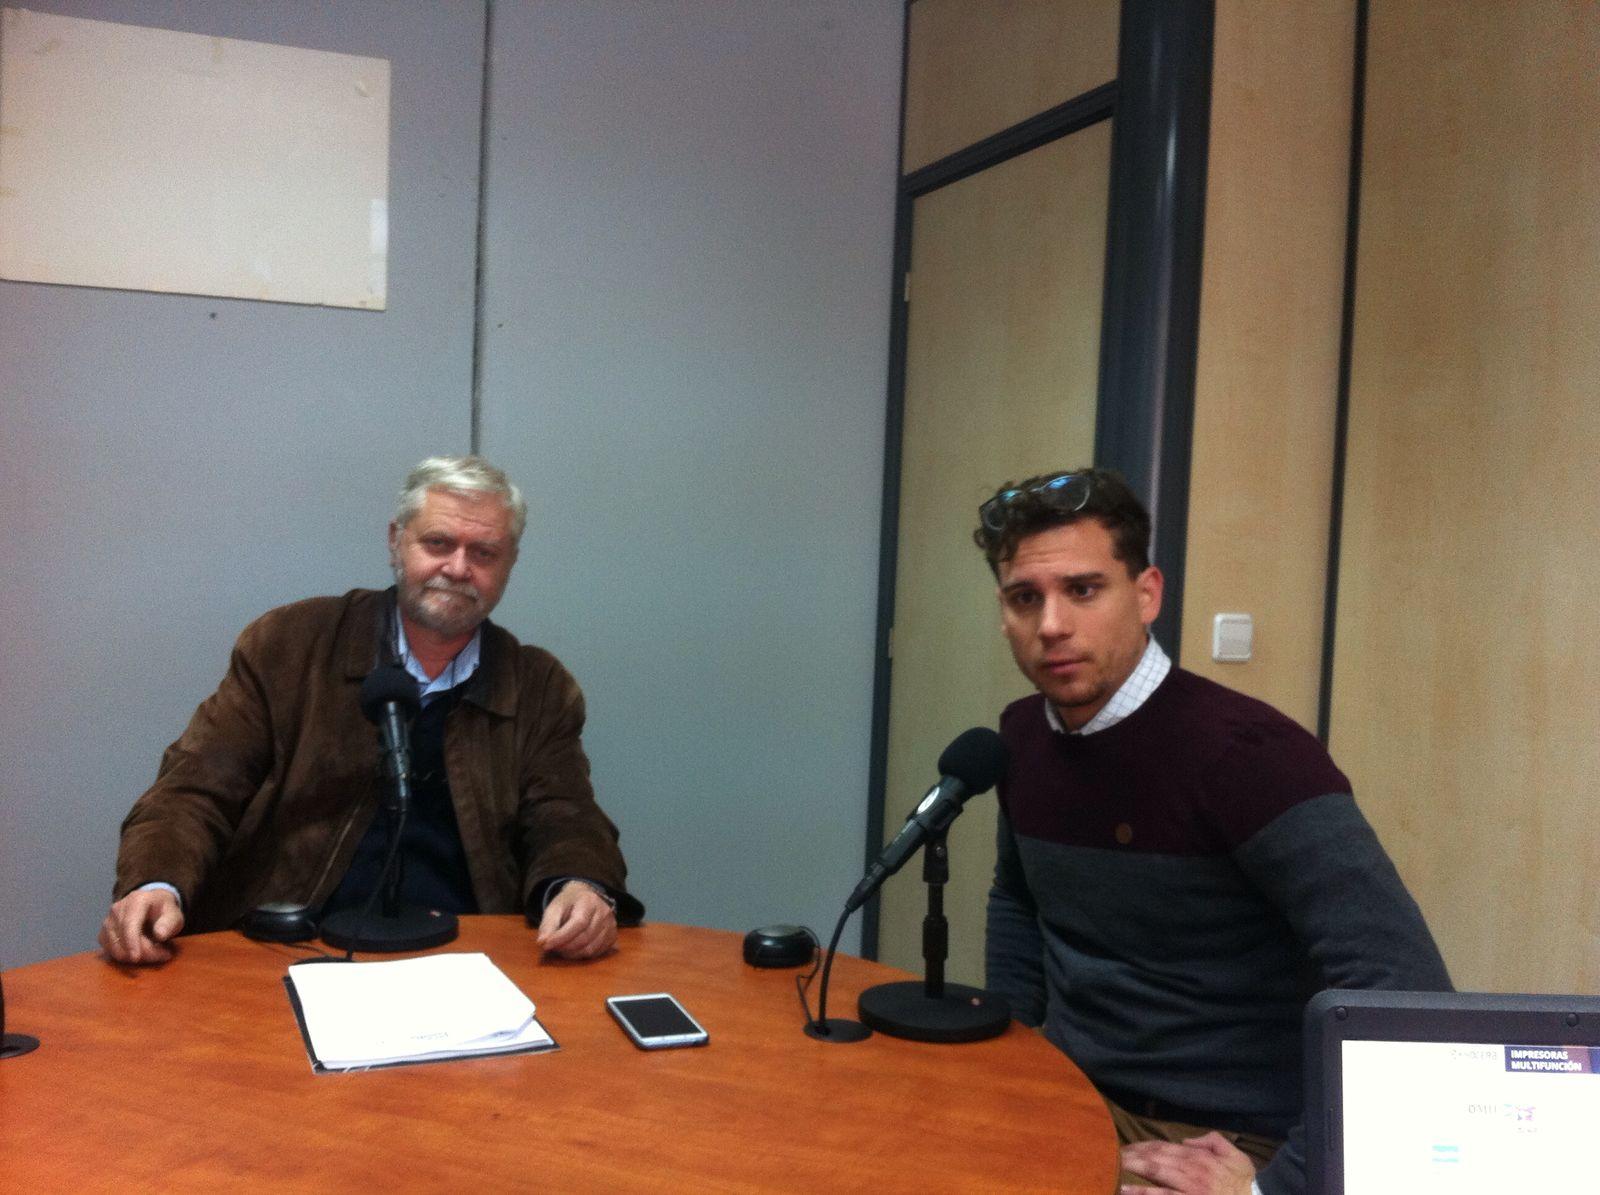 David Ibáñez VOX y Francis Martínez en la Junga. Radio 4G